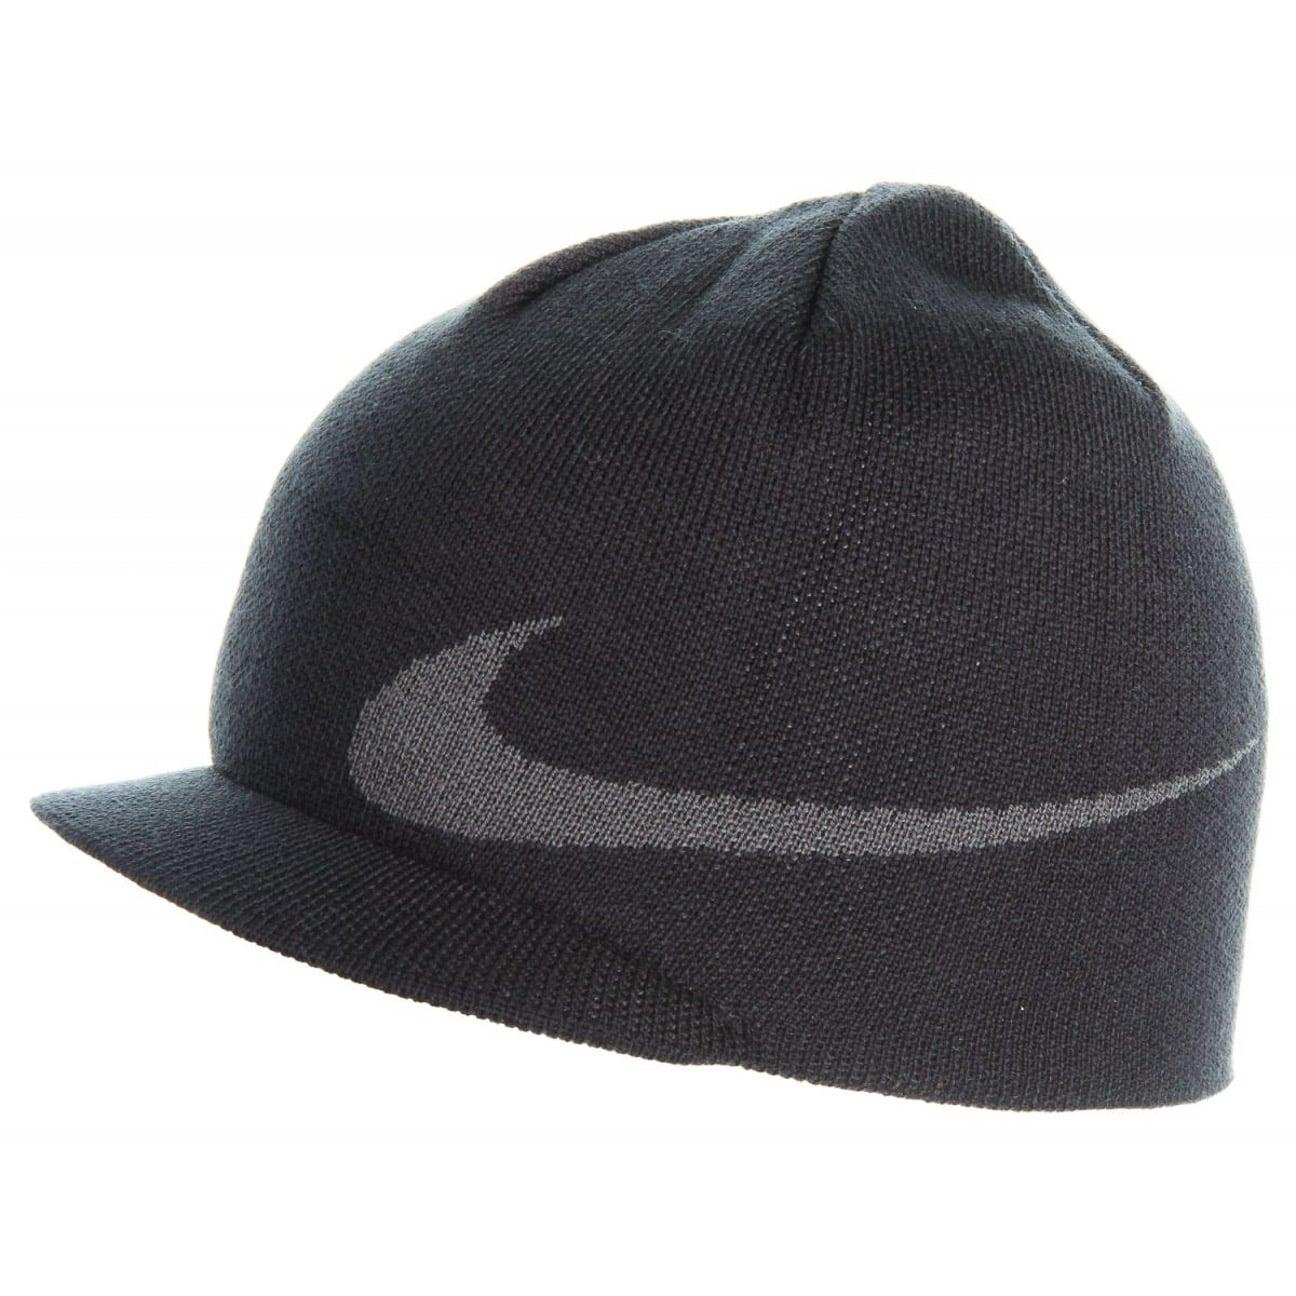 057fbdbd47376 ... Sporty Peak Pull On by Nike - black 1